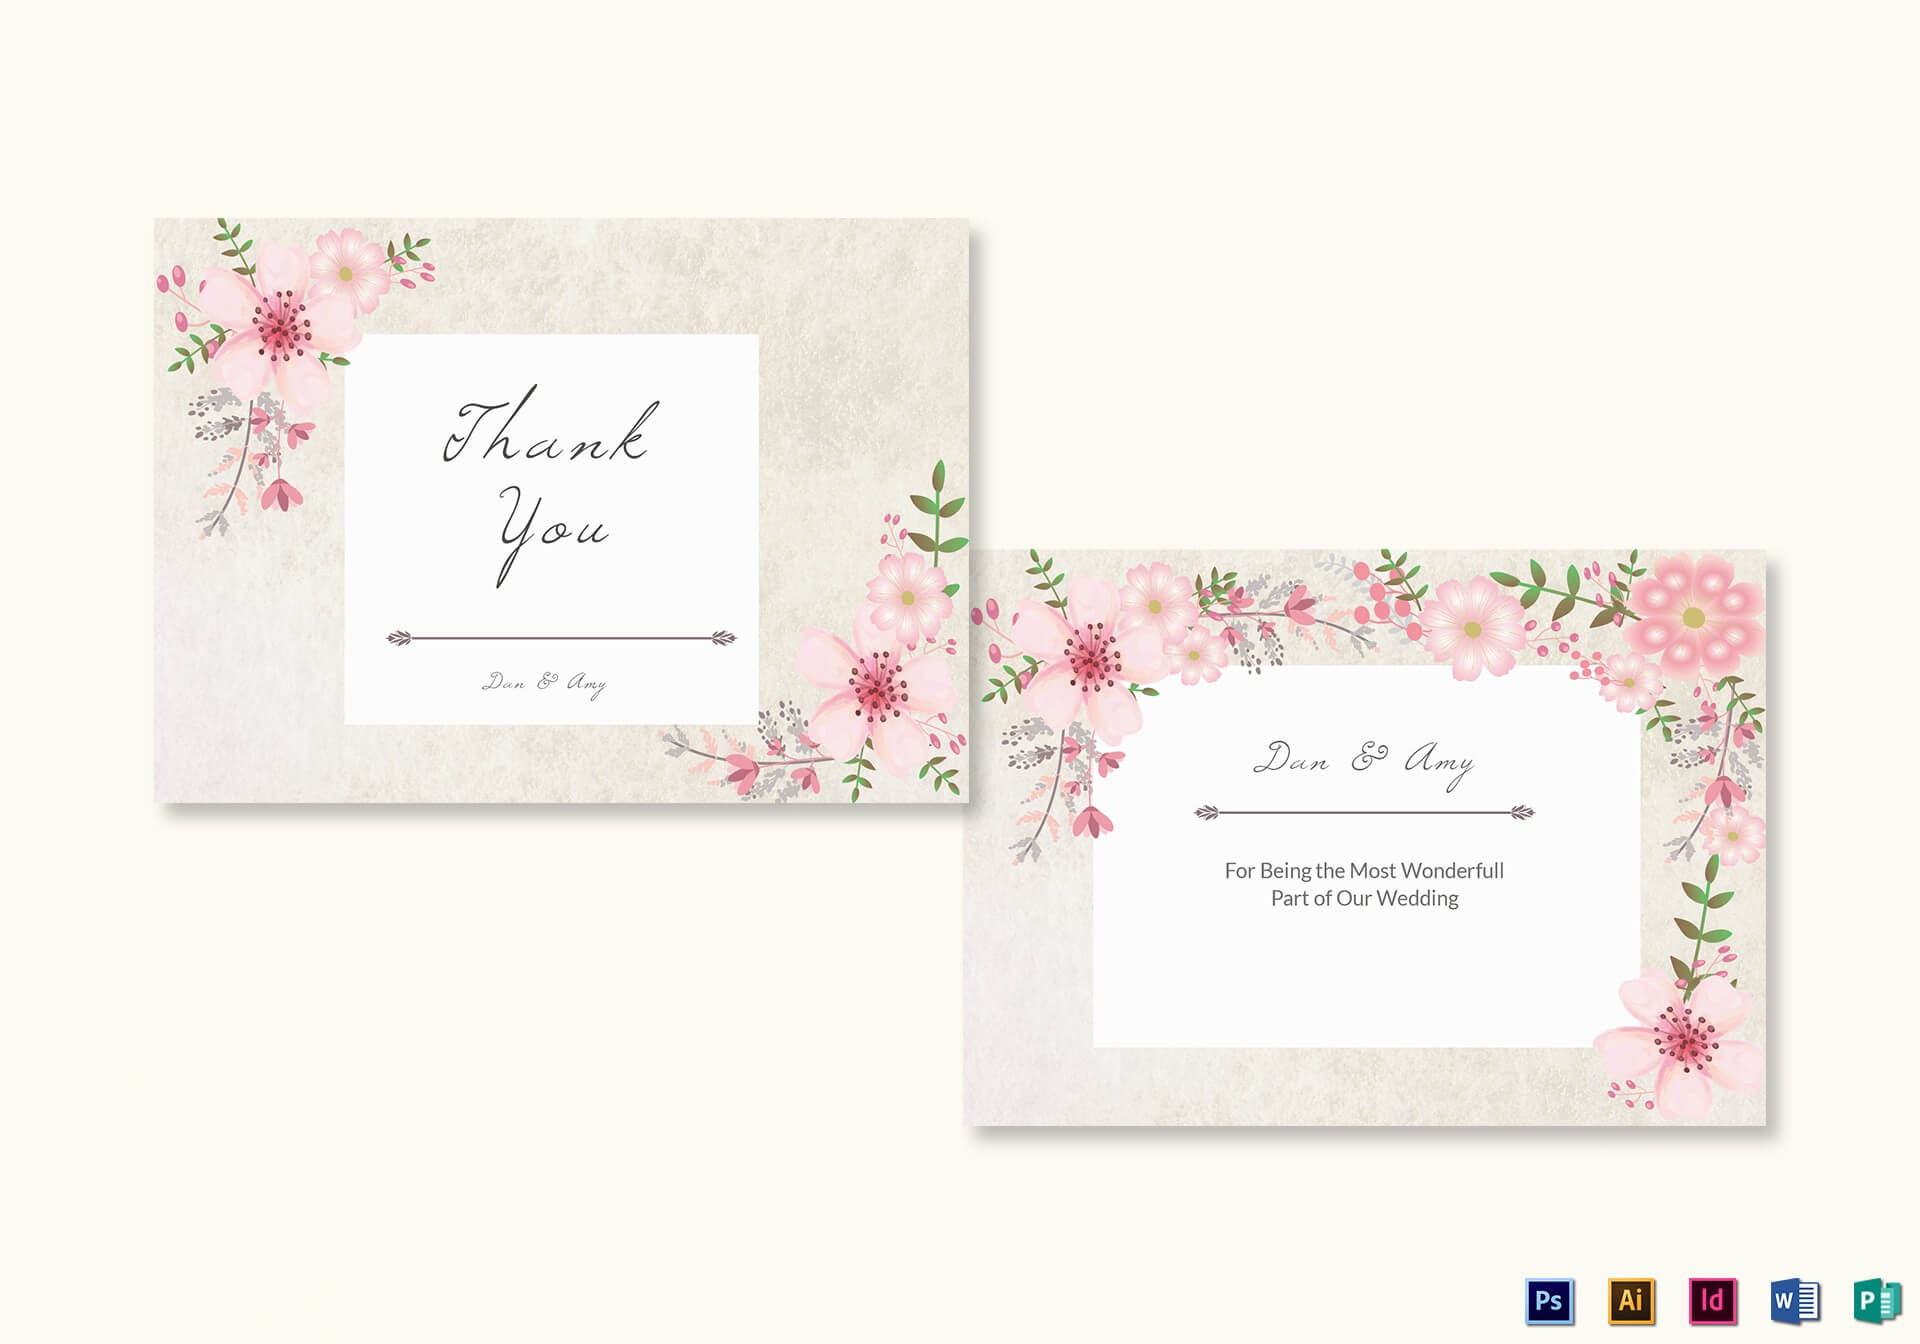 026 Thank You Cards Template Ideas Wedding Shocking Free For Thank You Card Template Word